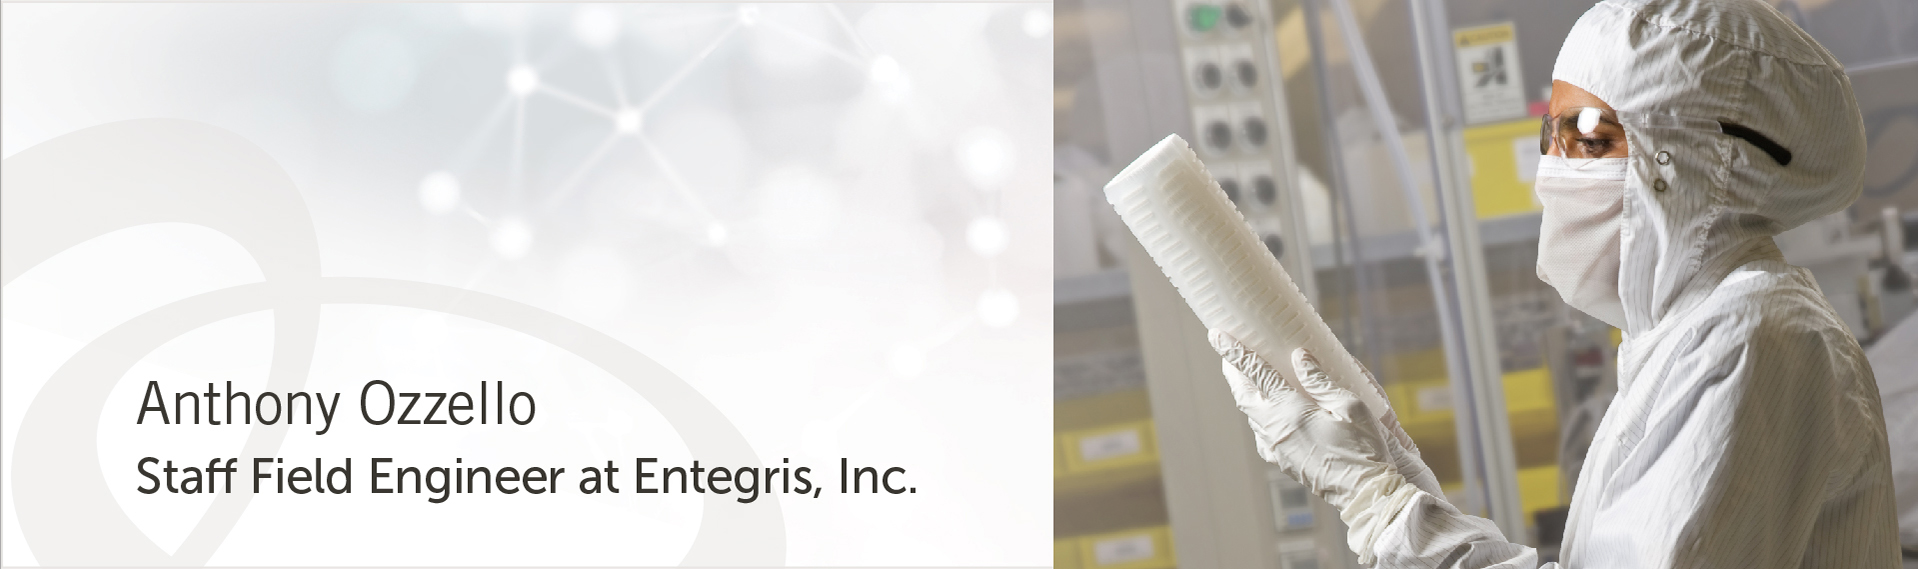 liquid-filtration-webinar-hubspot-11523-desktop-1918x568